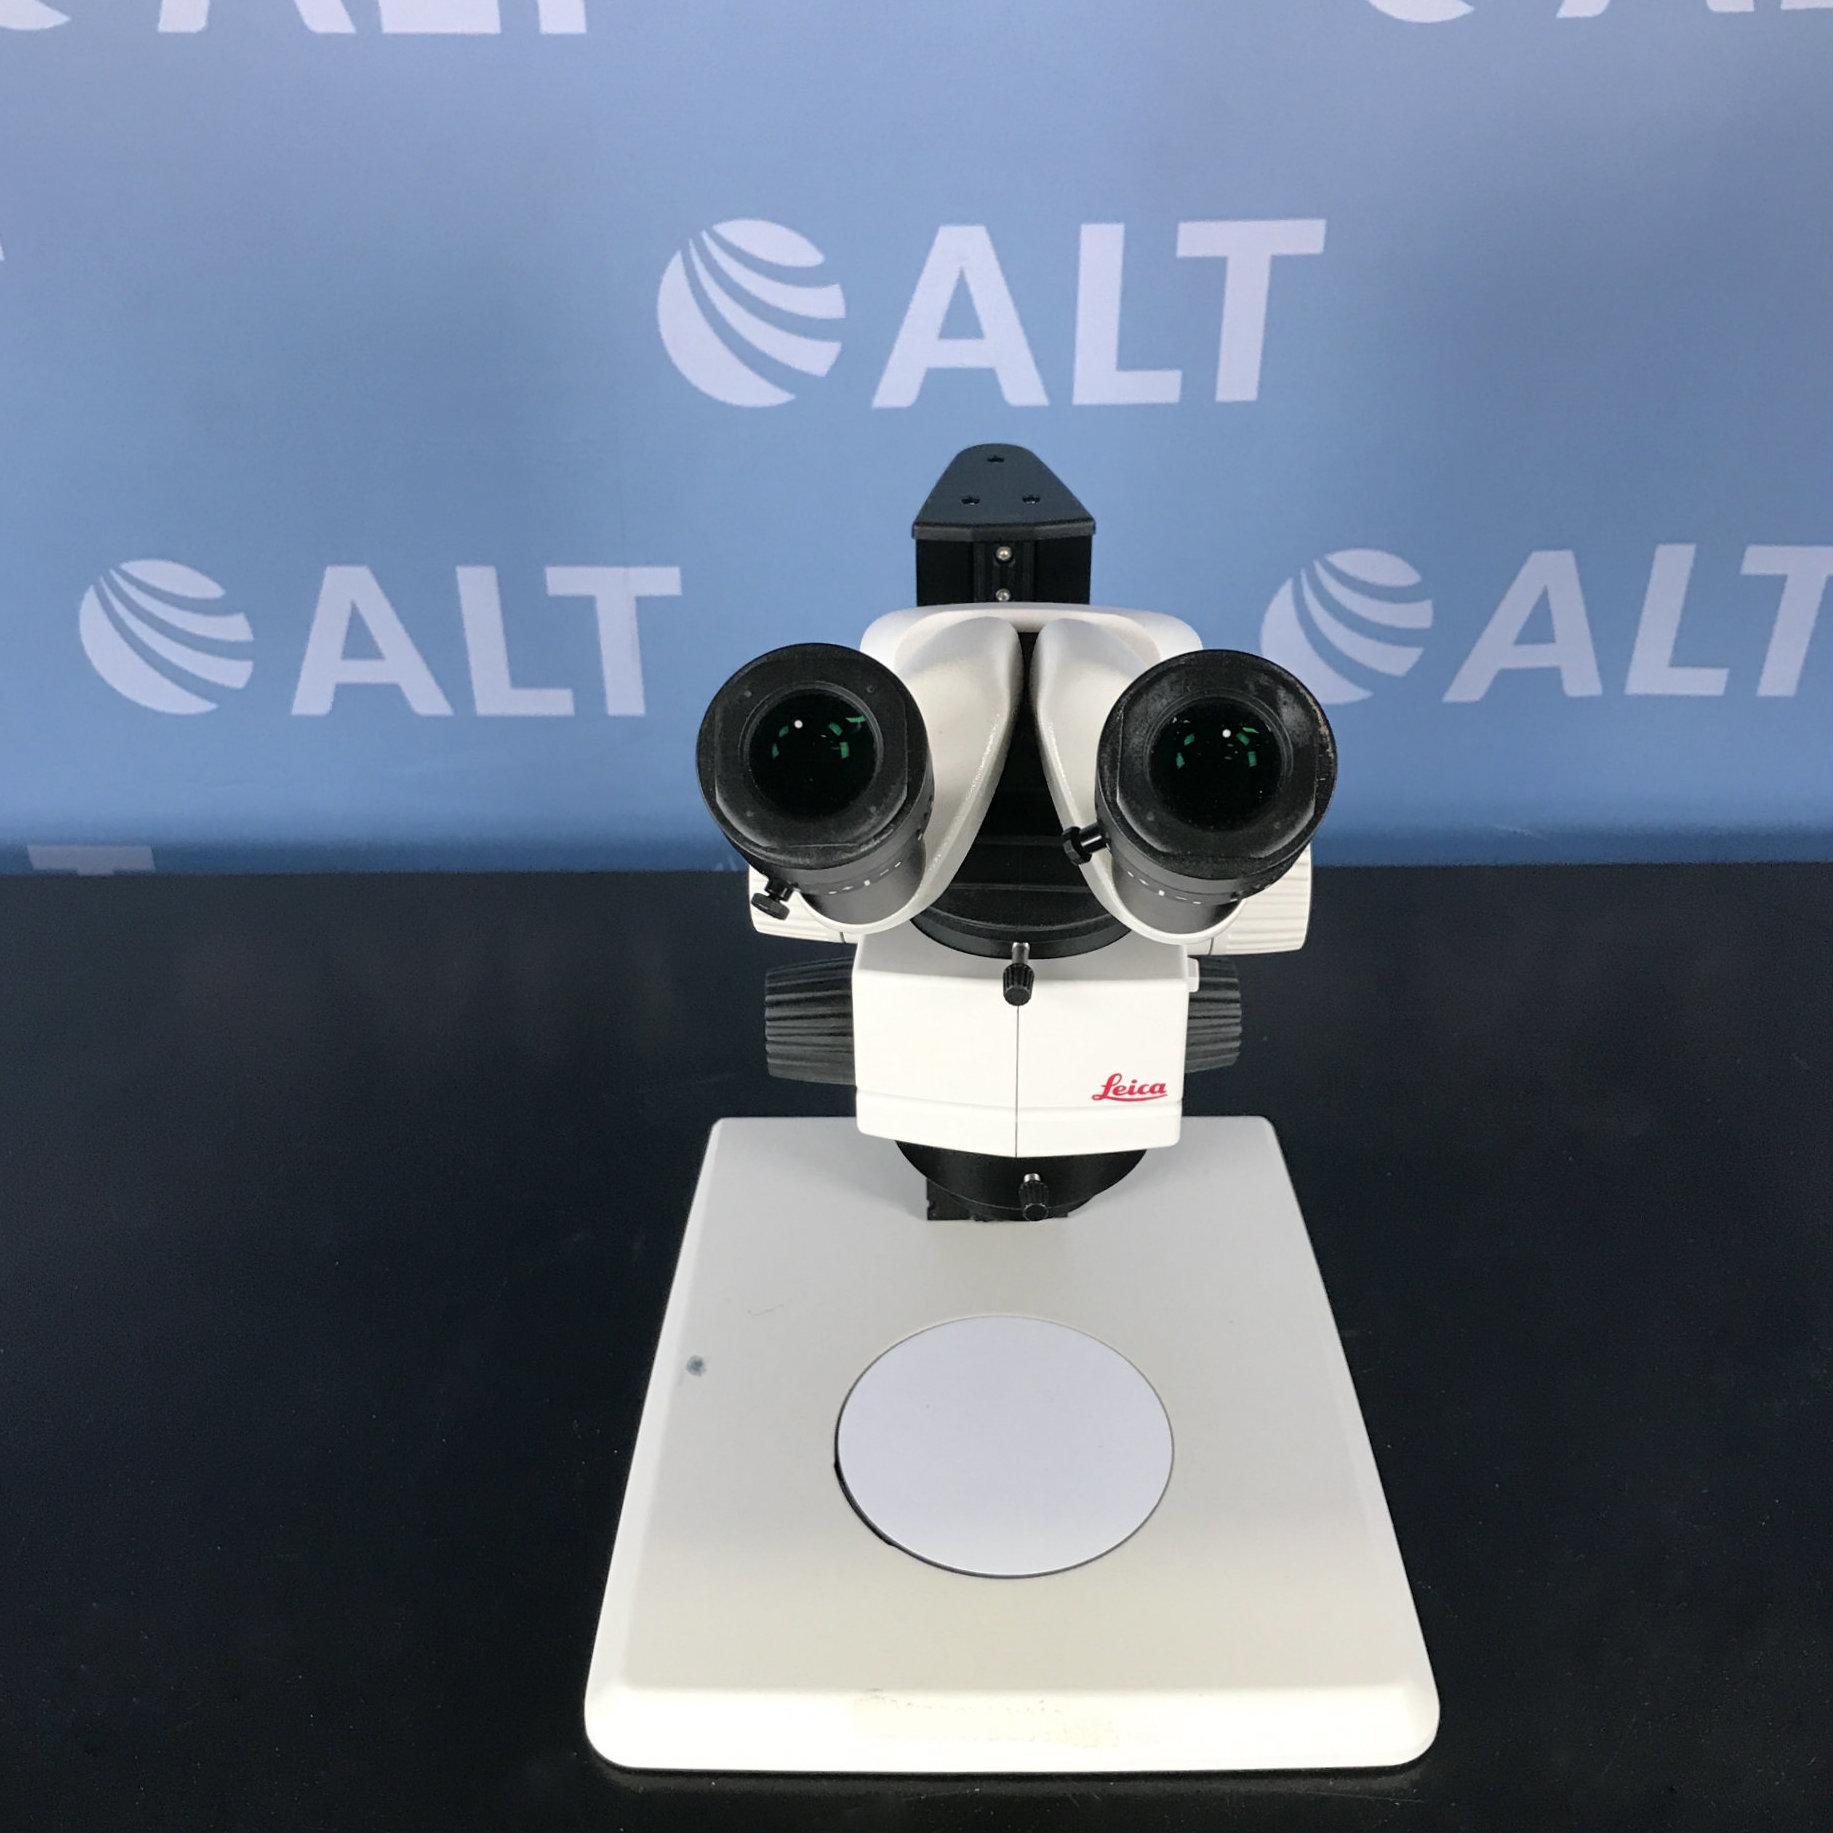 Leica M60 Stereo Microscope Image